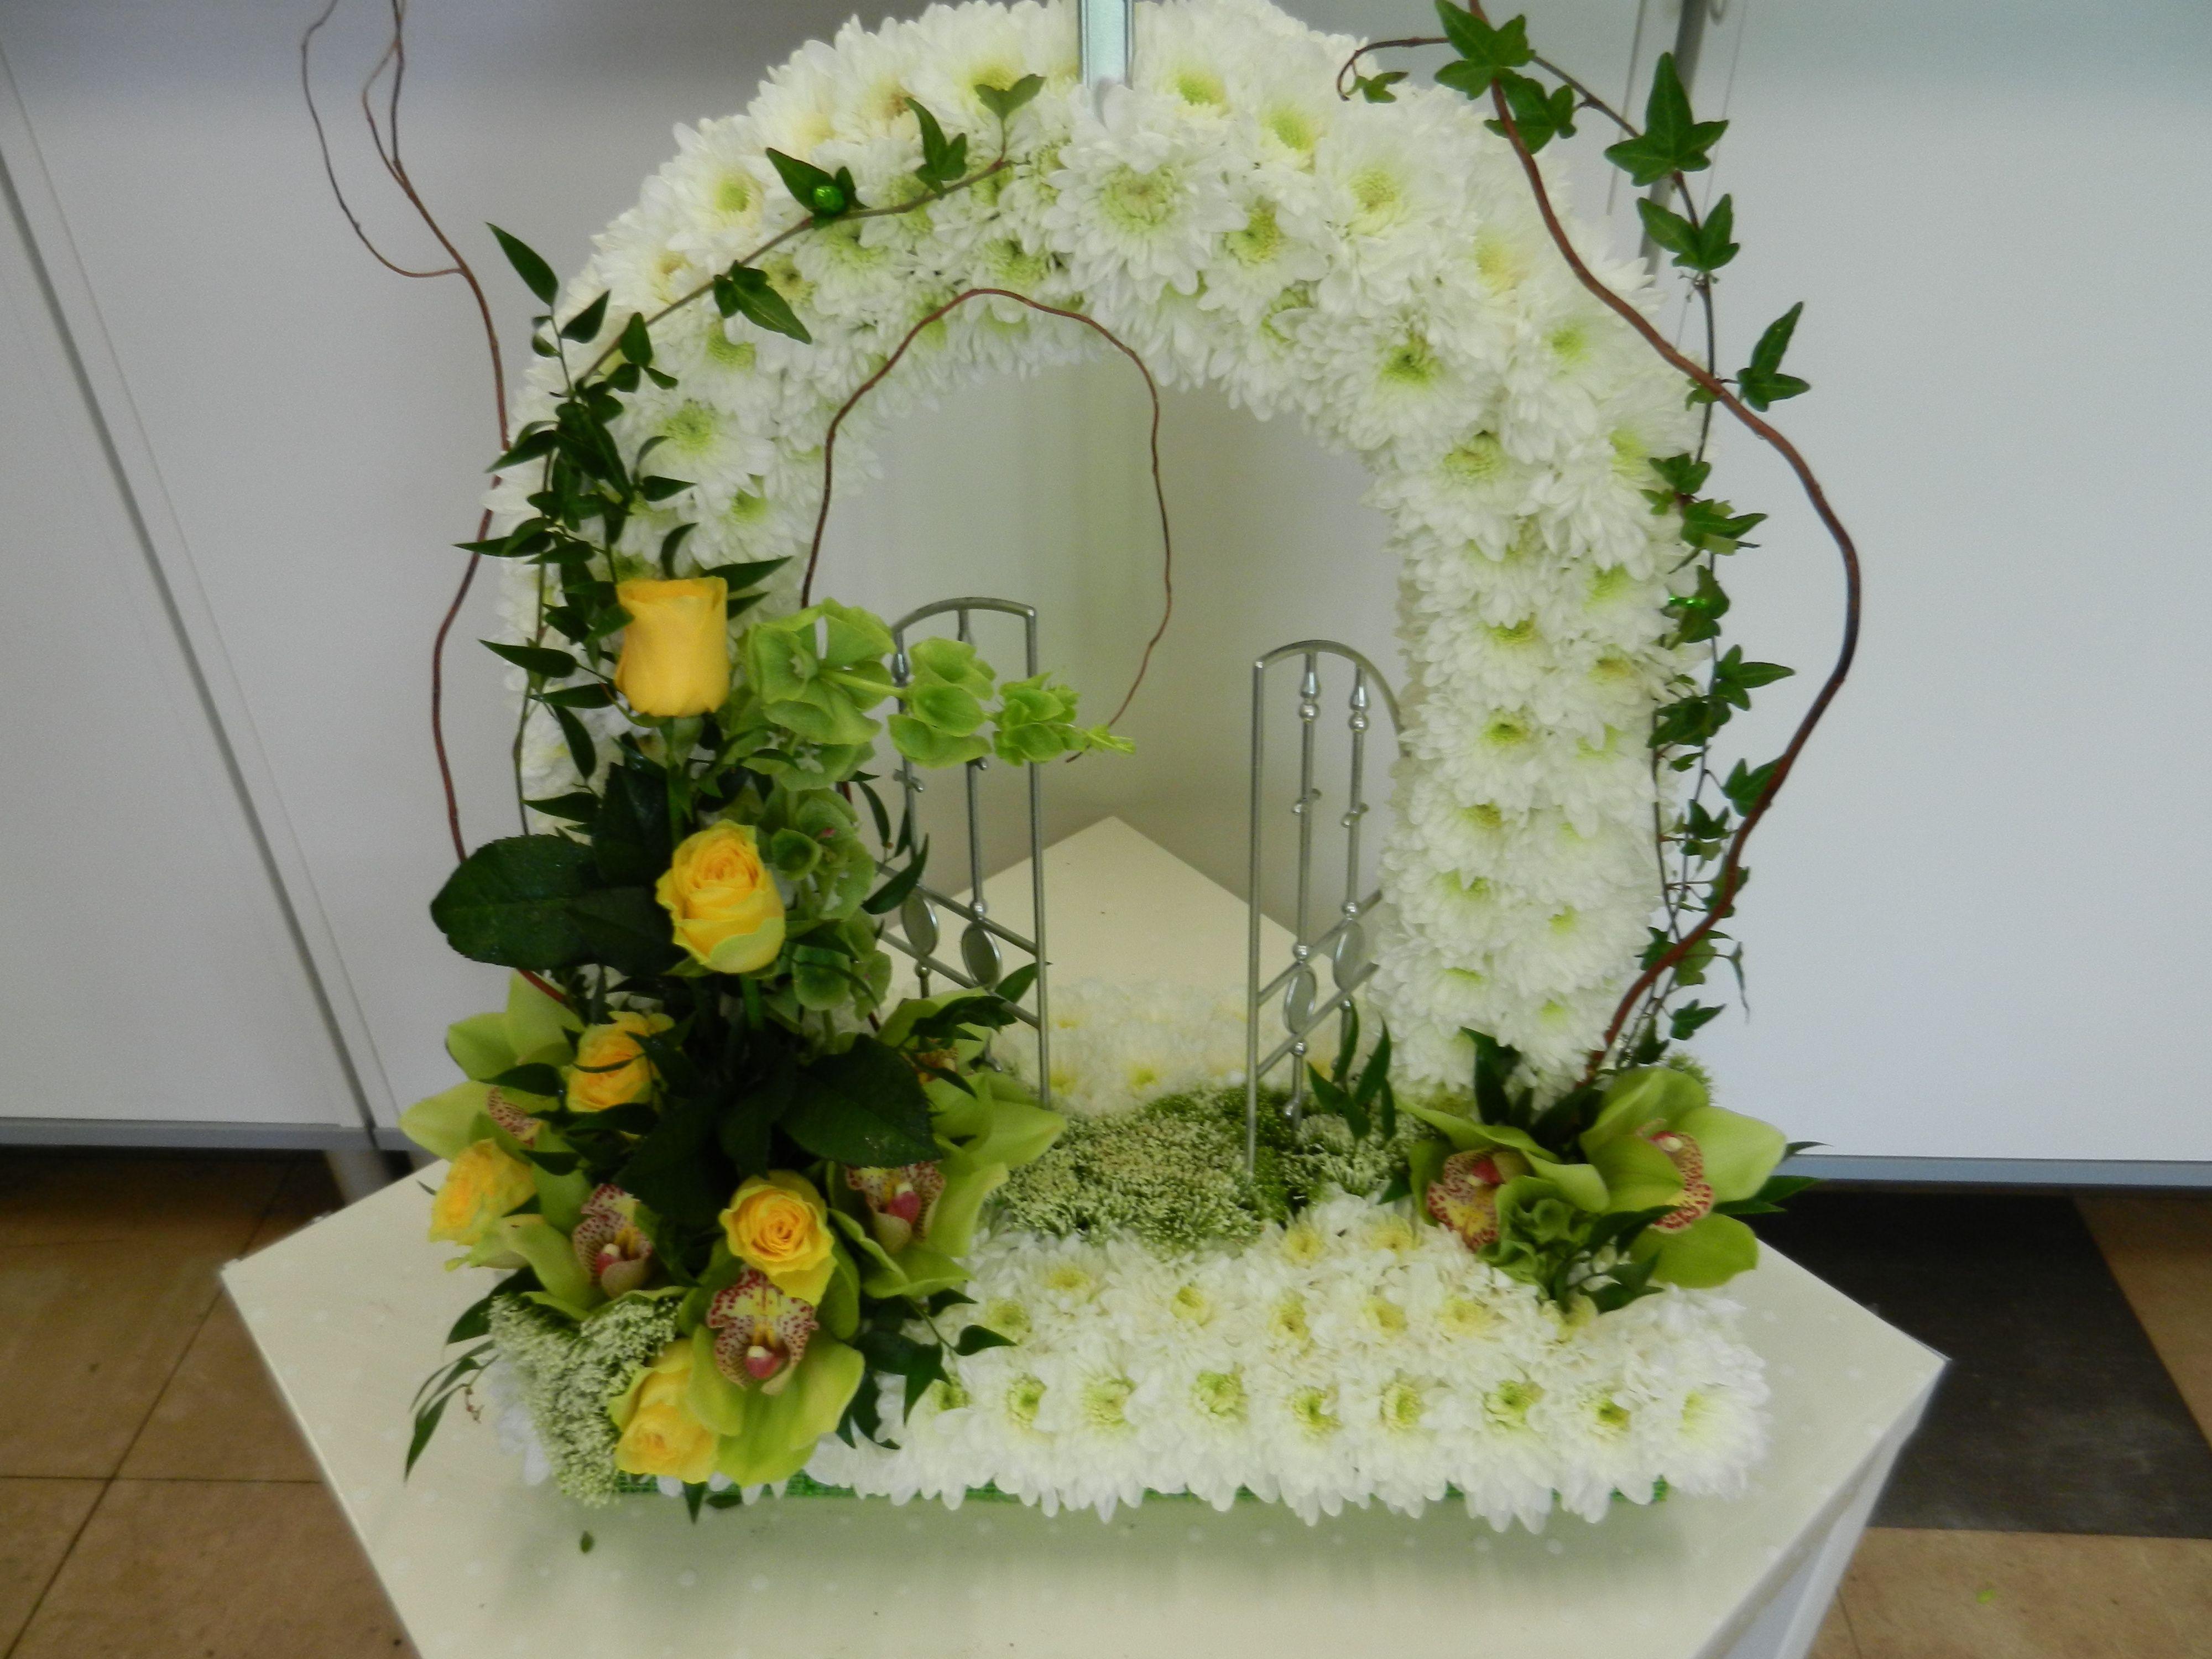 Gates of heaven arreglos florales pinterest gates funeral and gates of heaven sympathy flowersfuneral izmirmasajfo Choice Image